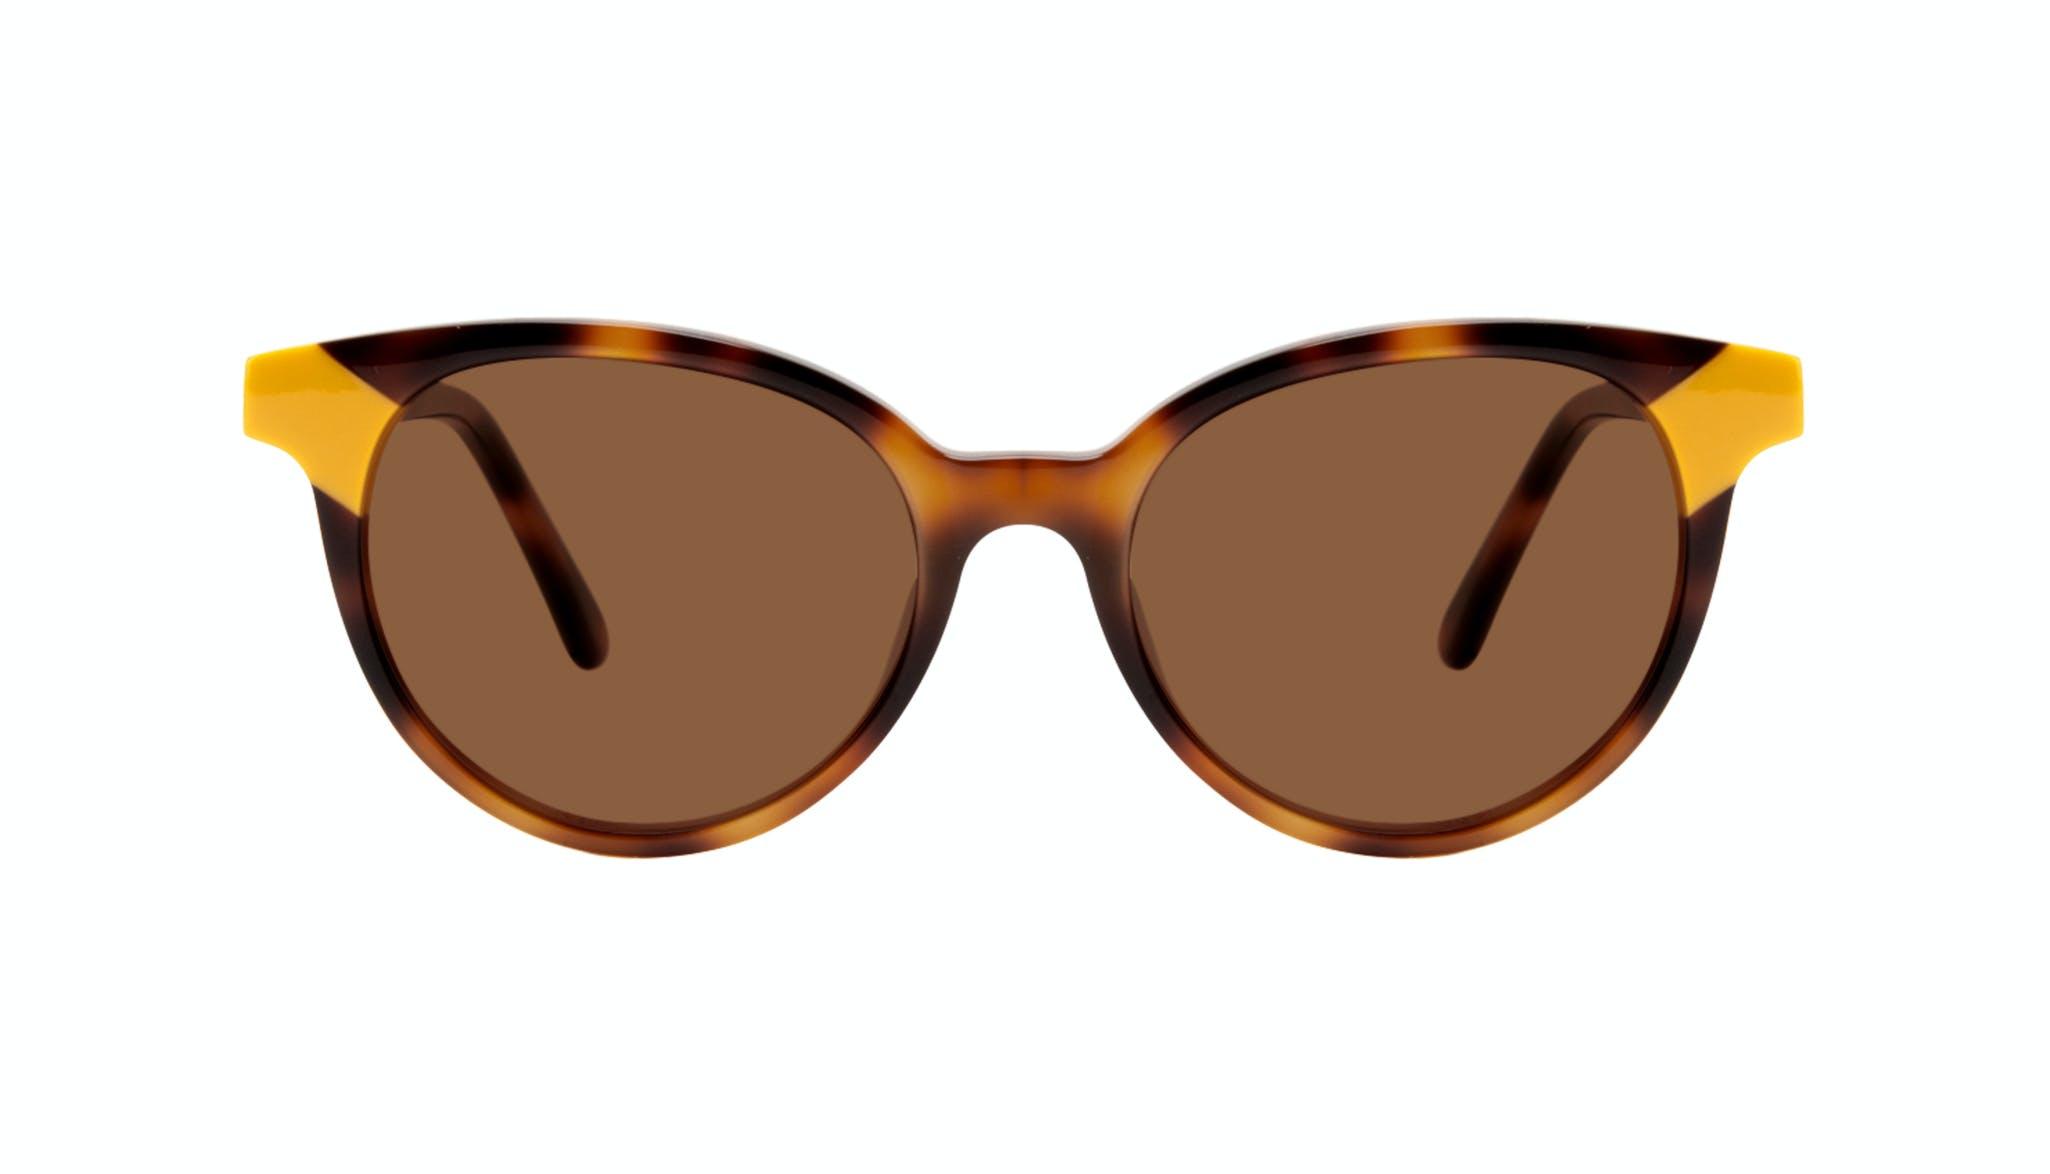 Affordable Fashion Glasses Round Sunglasses Women Bright Yellow Pop